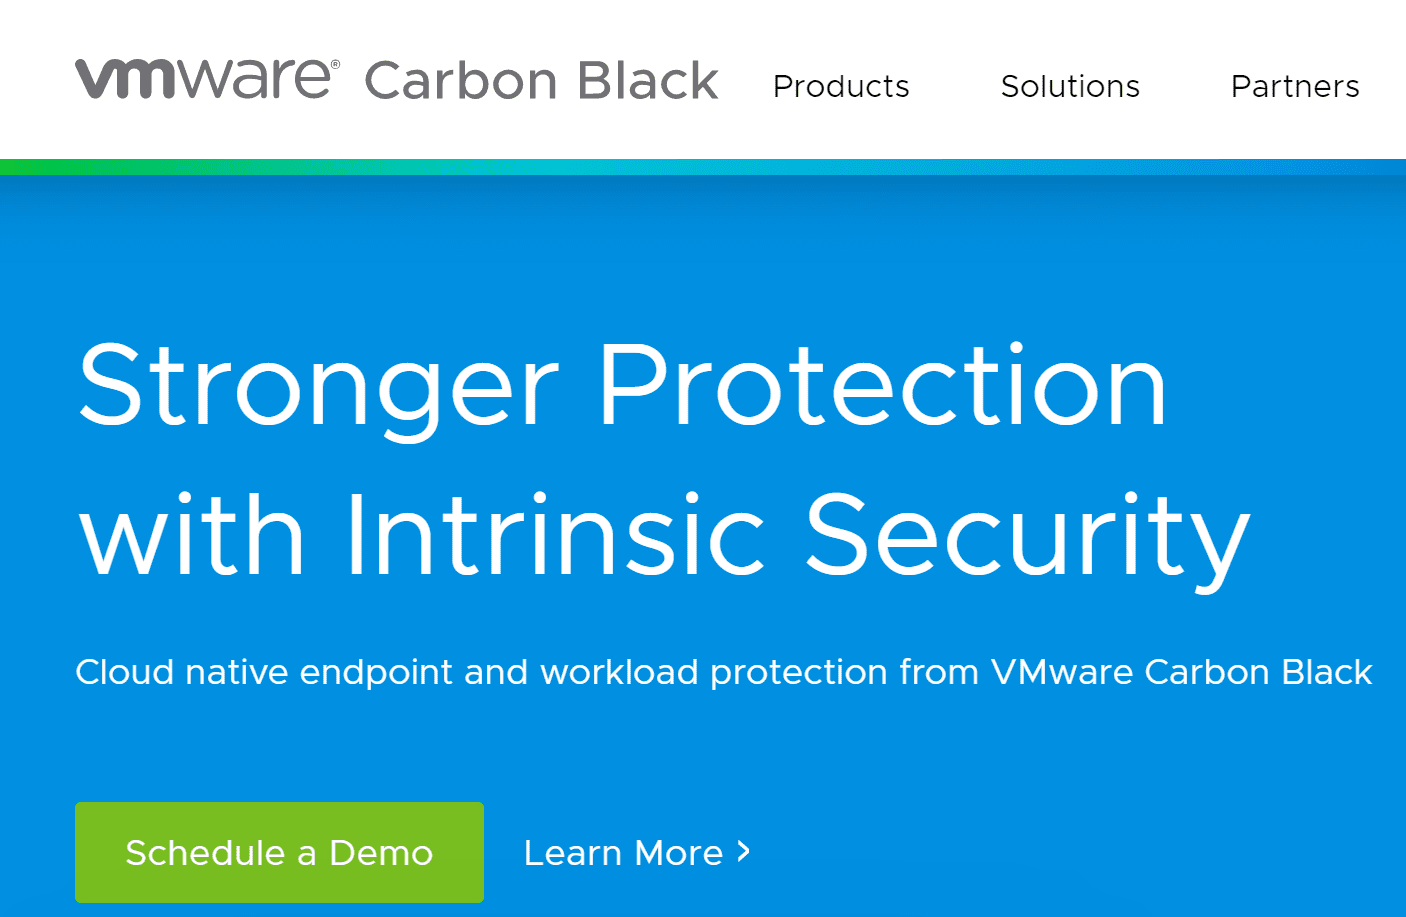 VMware-Carbon-Black-Cloud-Workload-Announced